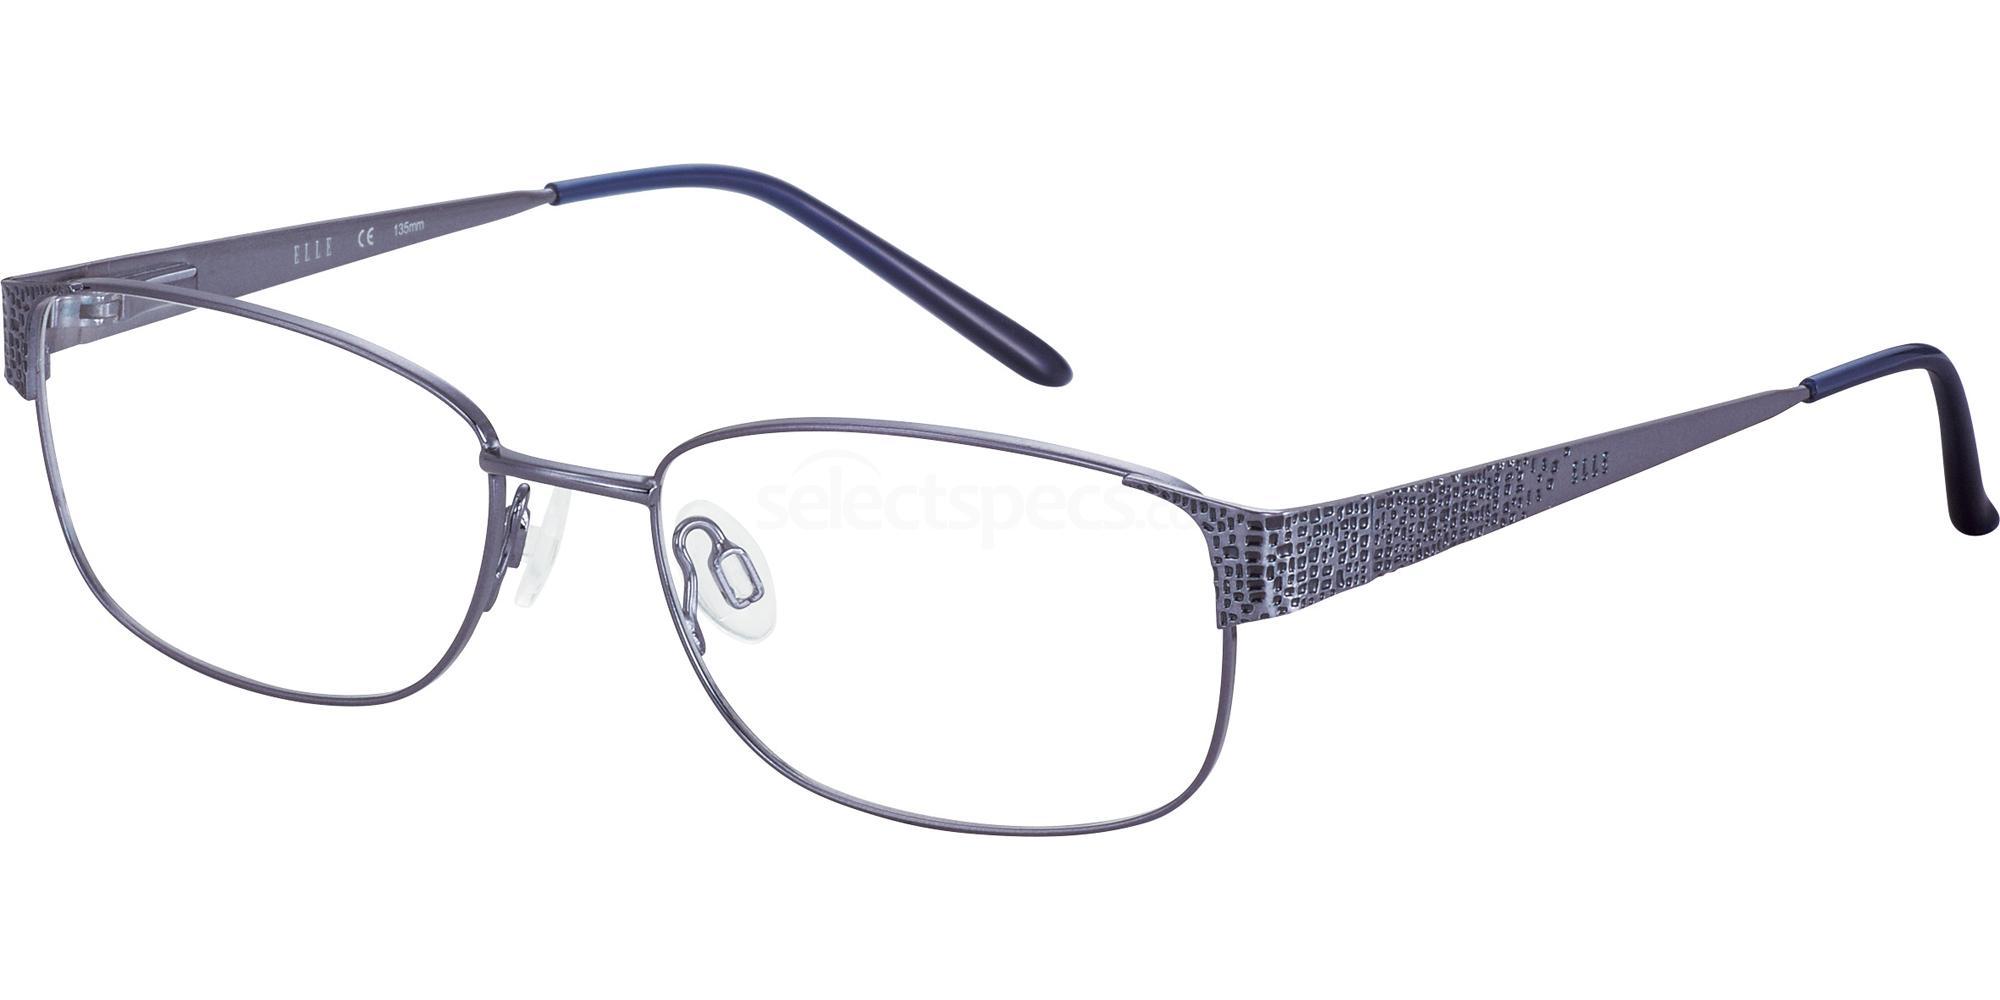 BL EL13408 Glasses, ELLE